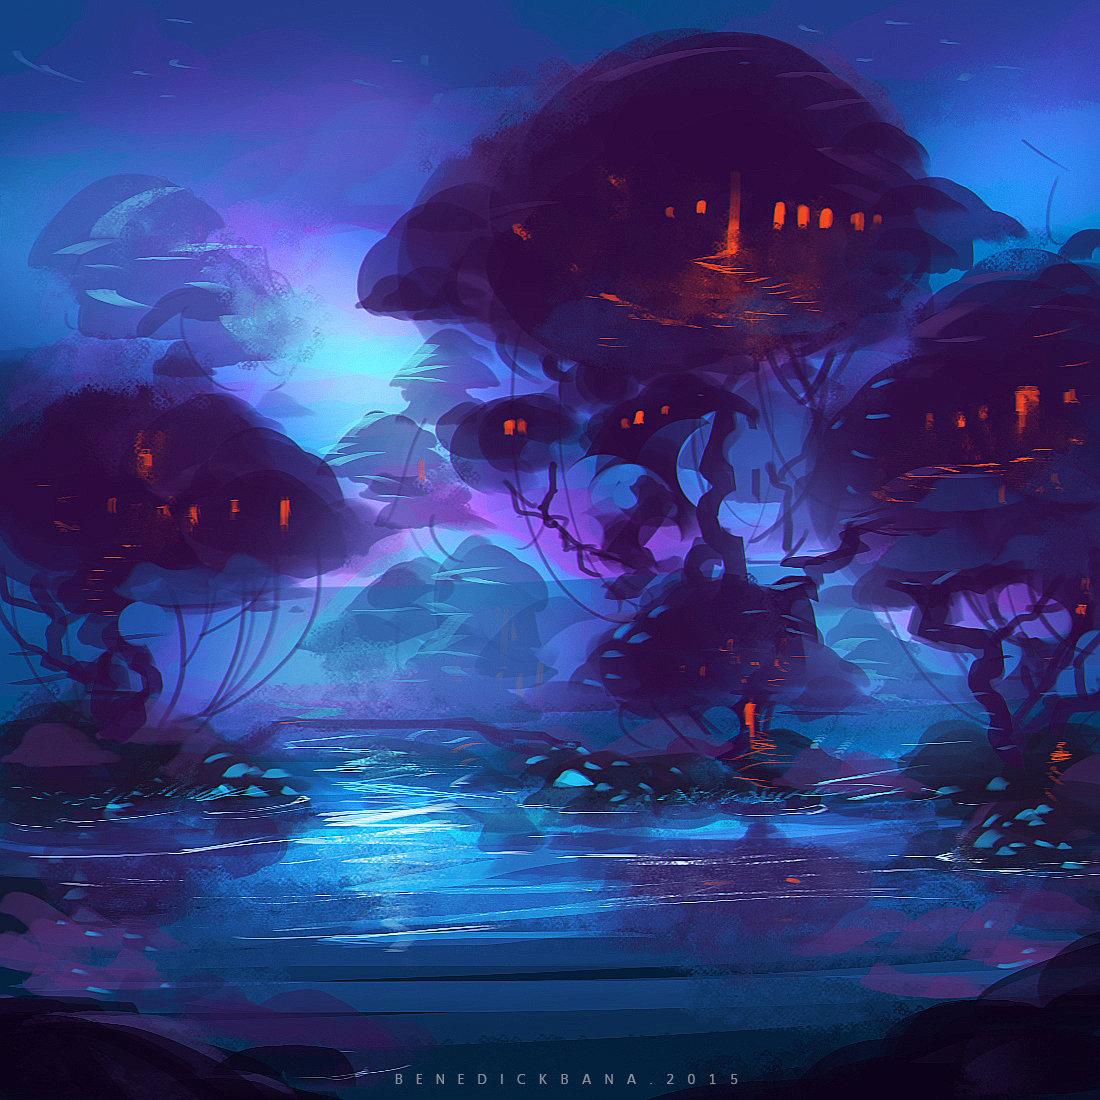 Benedick bana mystic night forest